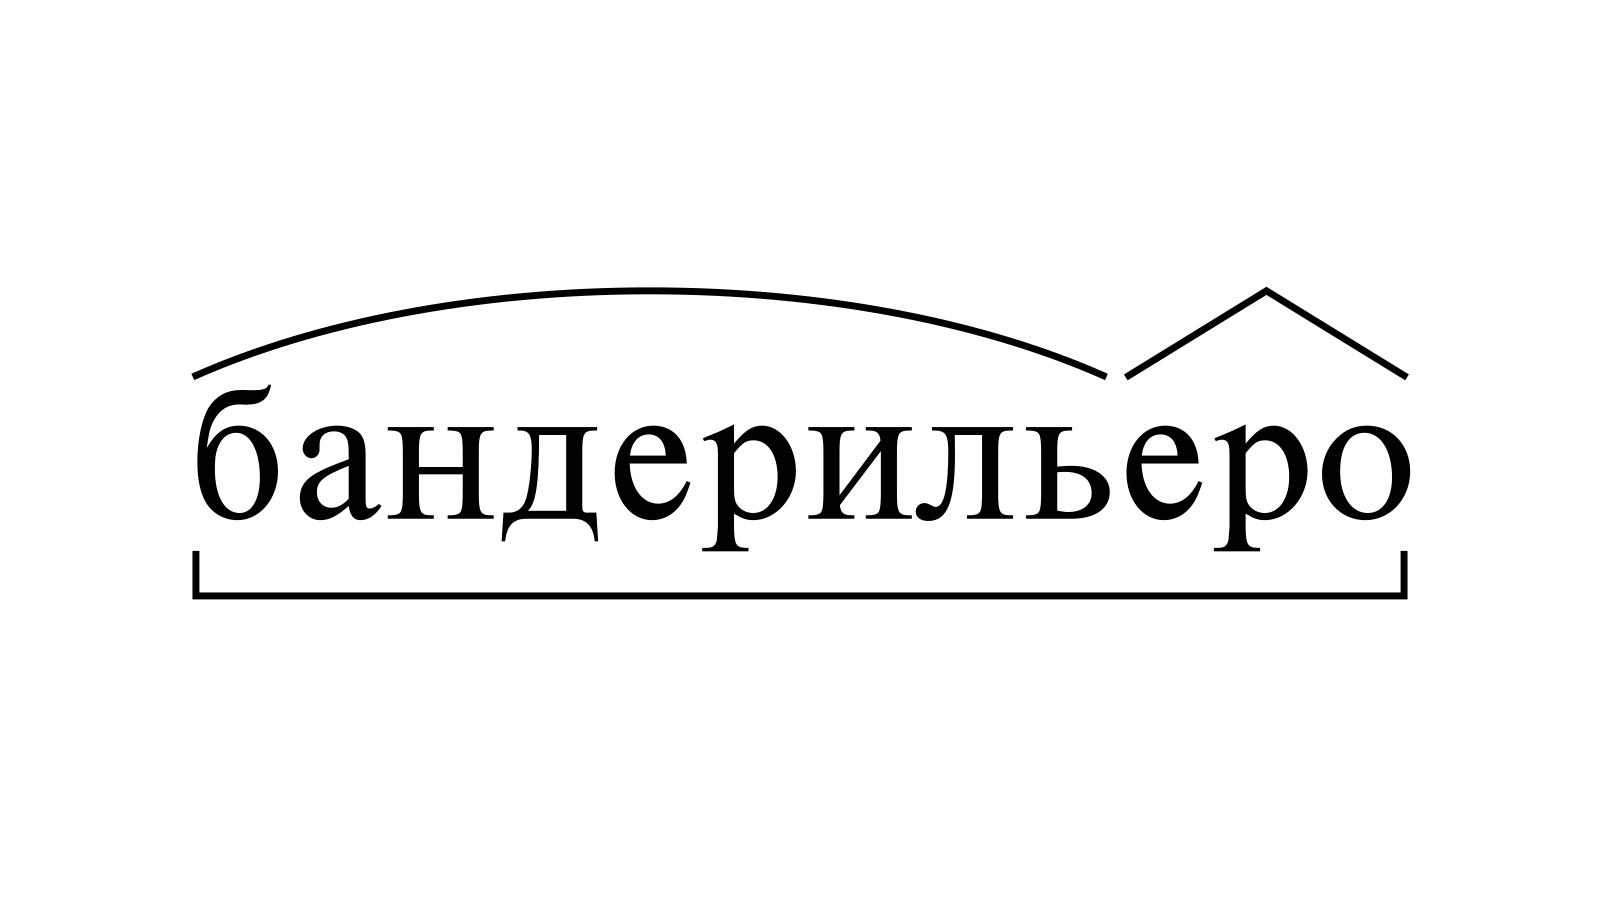 Разбор слова «бандерильеро» по составу